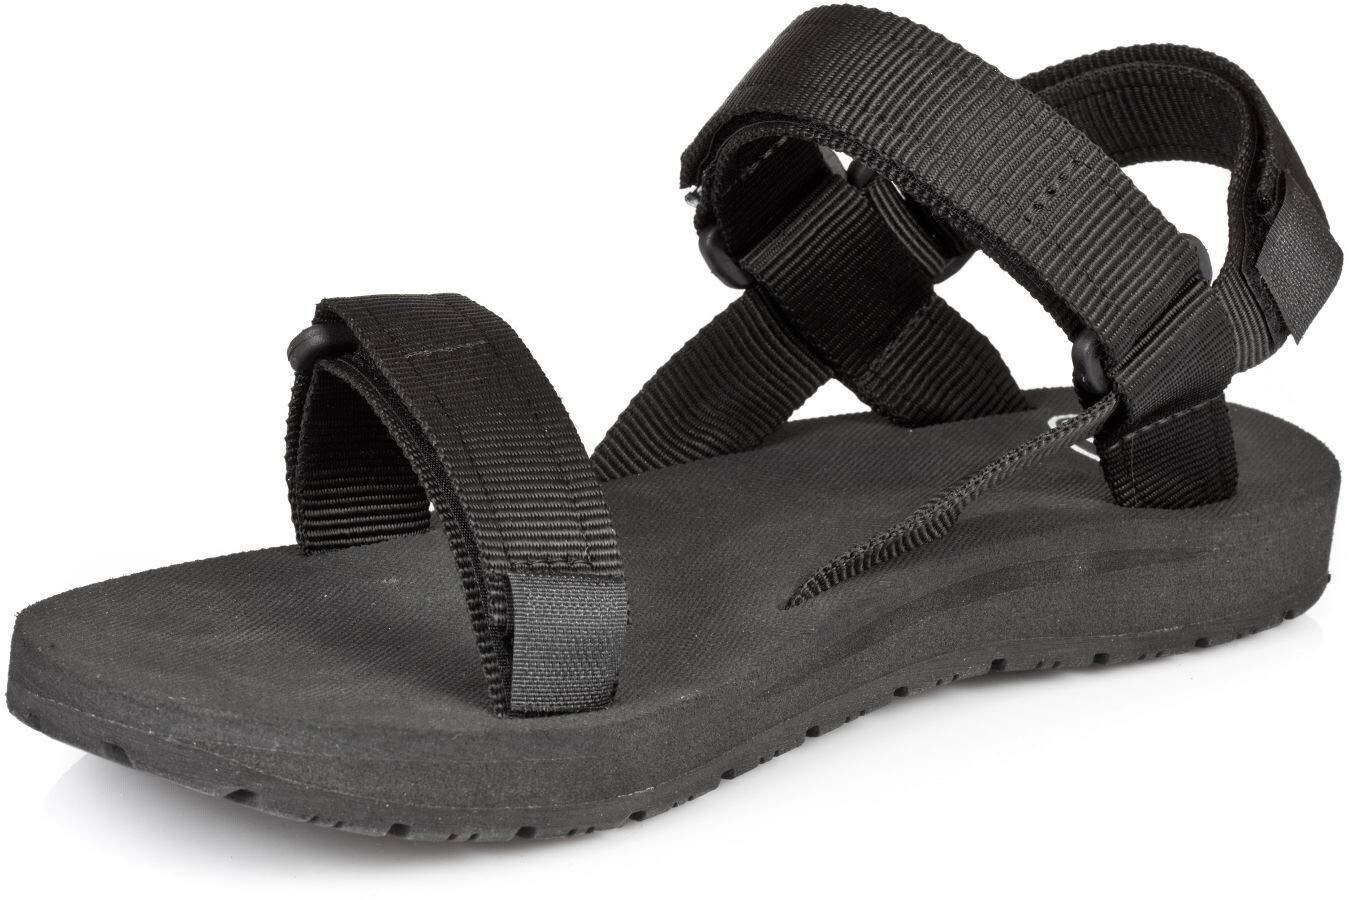 Source Herren Sandale Classic, Black, 38, 1010110038